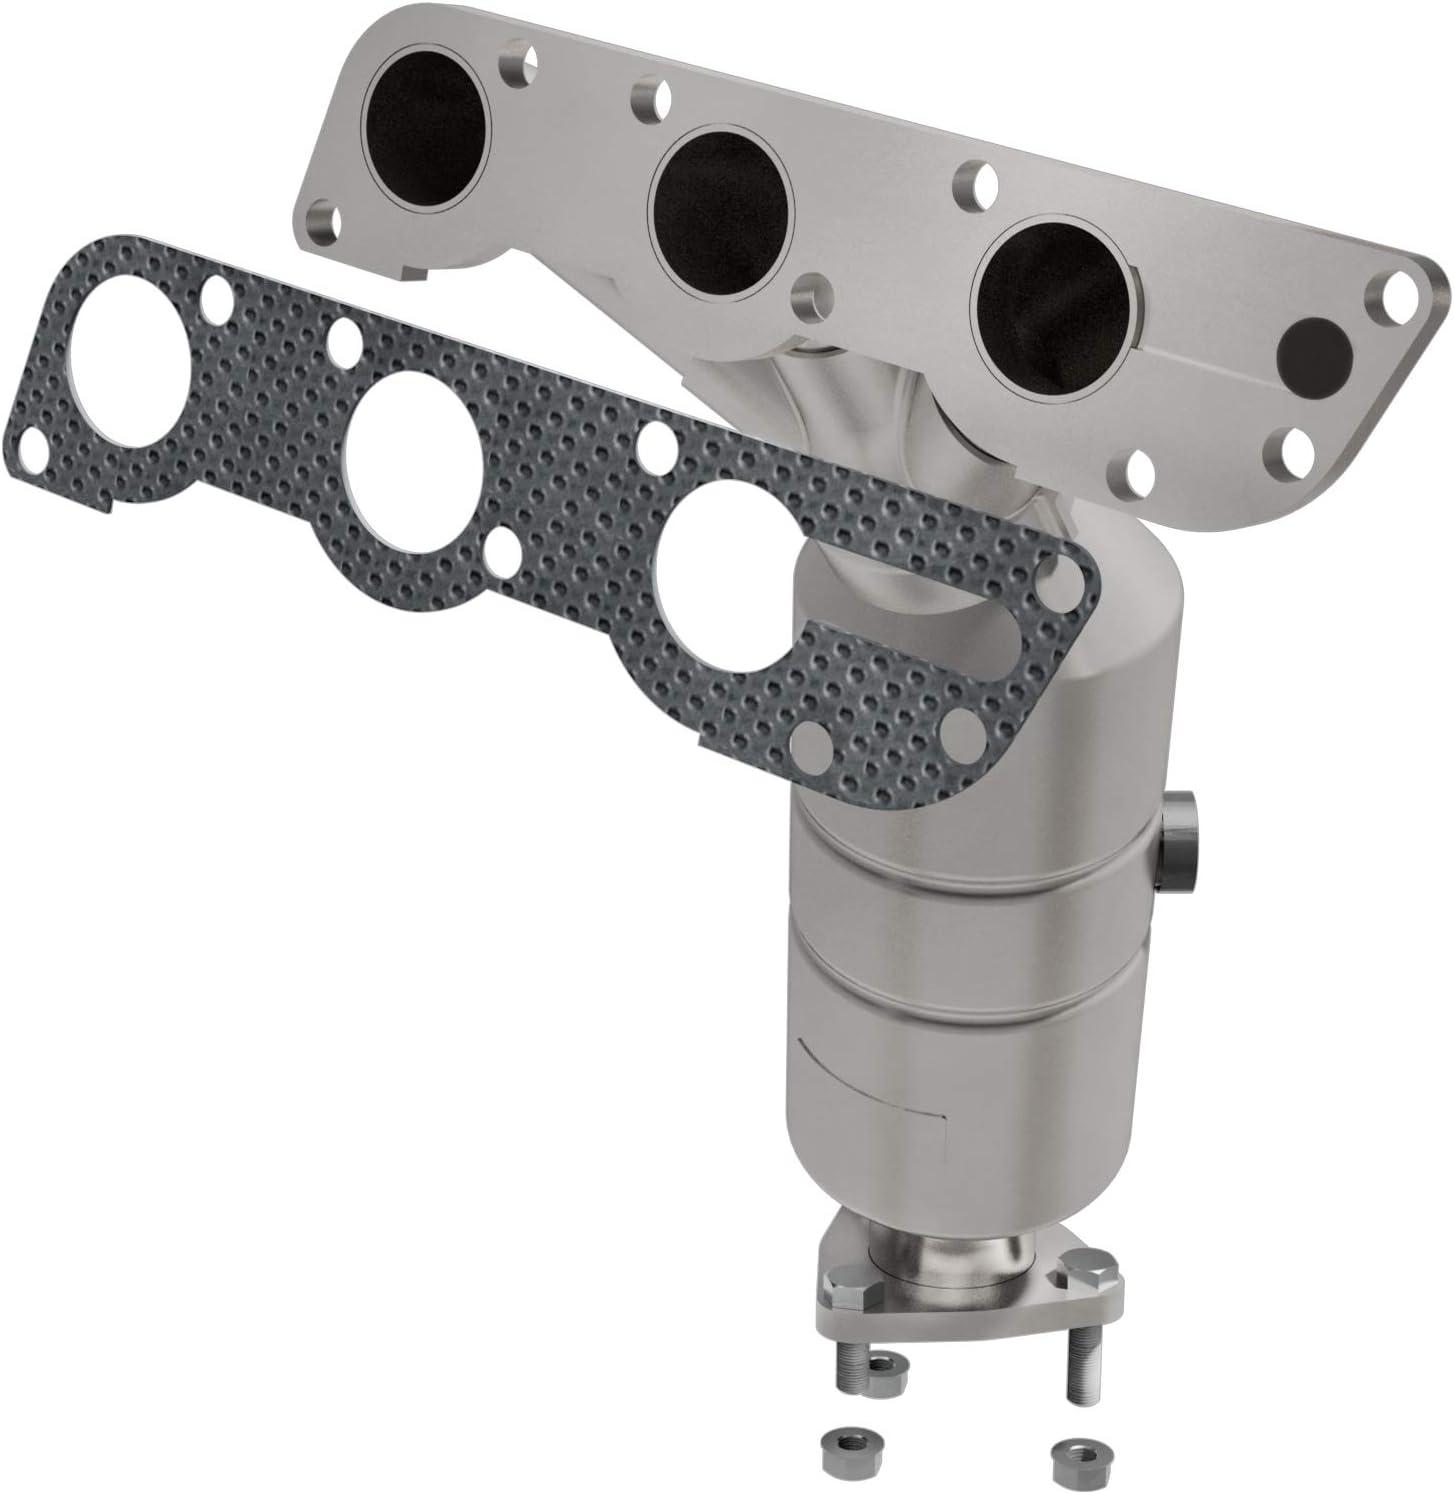 MagnaFlow 50911 Direct Fit Catalytic Converter Non CARB compliant